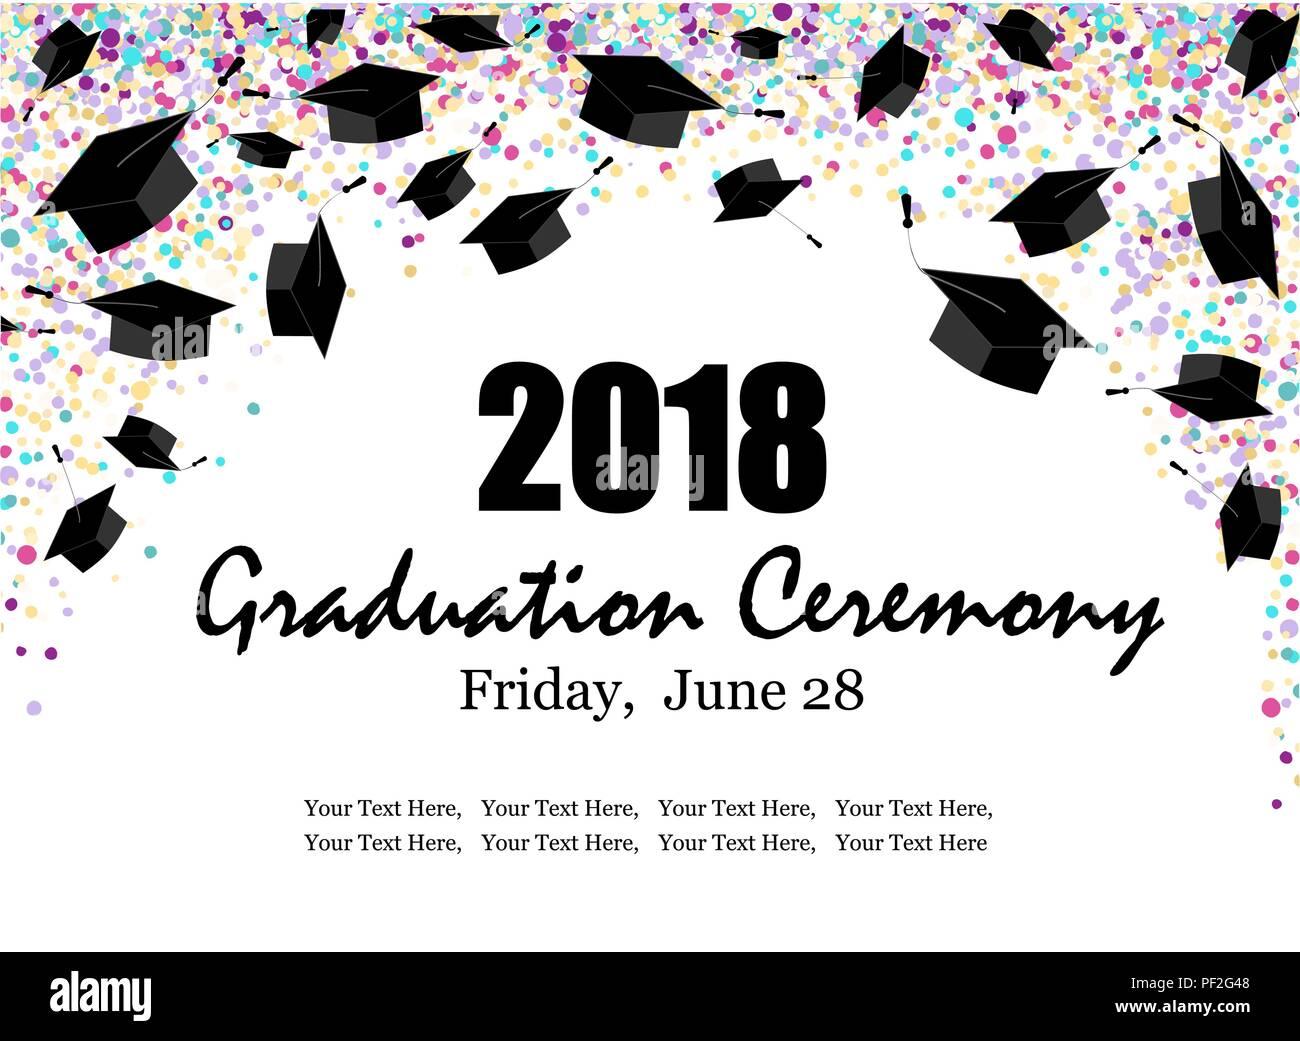 Graduate caps on bright multi colored confetti background. Graduate ceremony horizontal banner or card. Vector illustration - Stock Vector